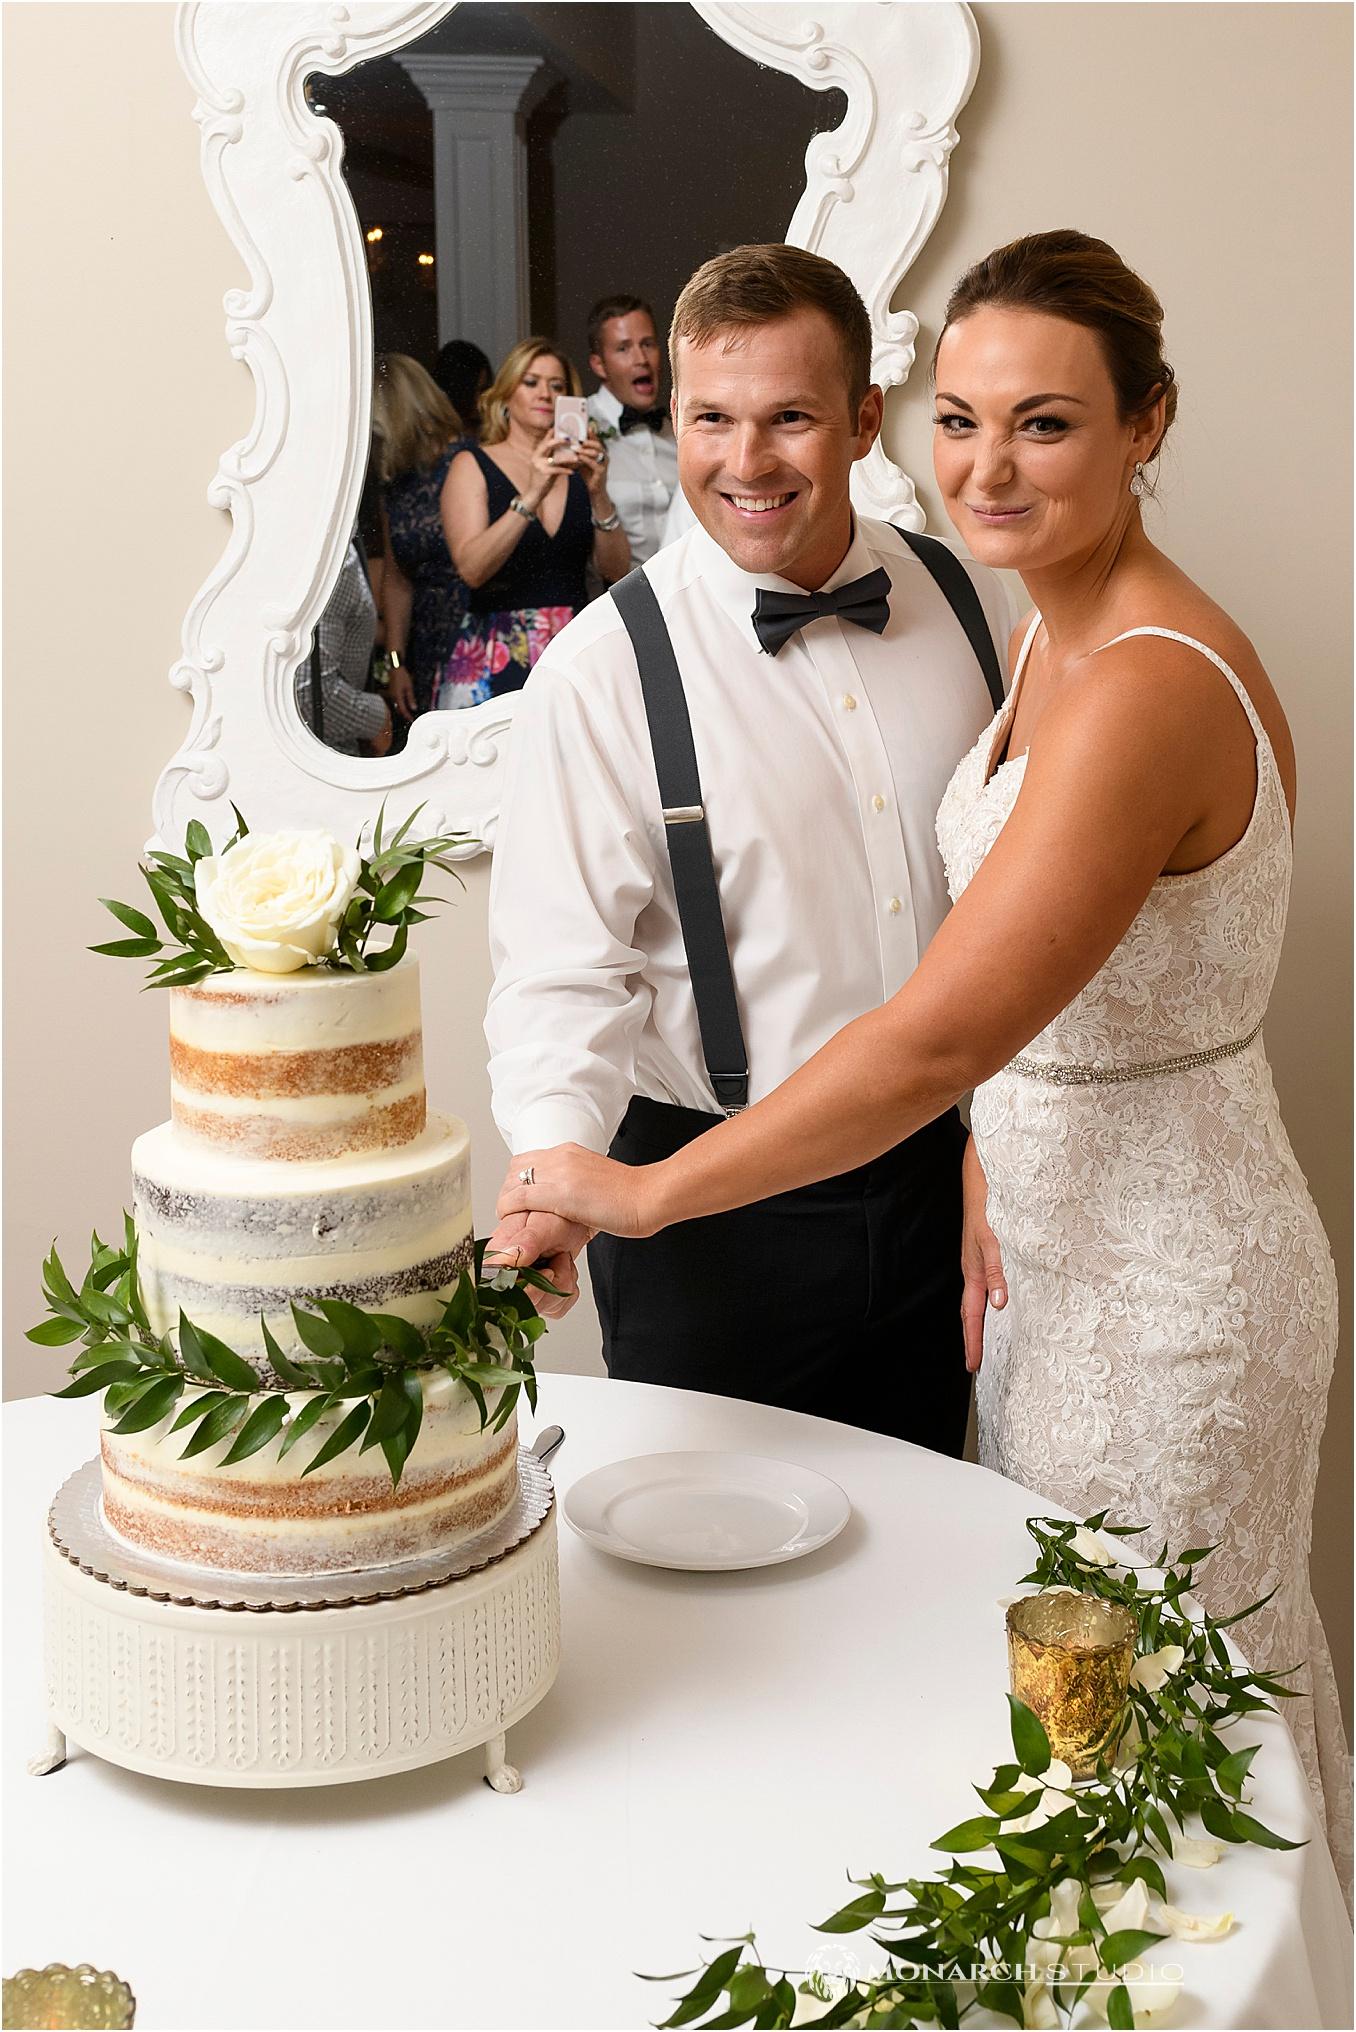 102-whiteroom-wedding-photographer-2019-05-22_0084.jpg